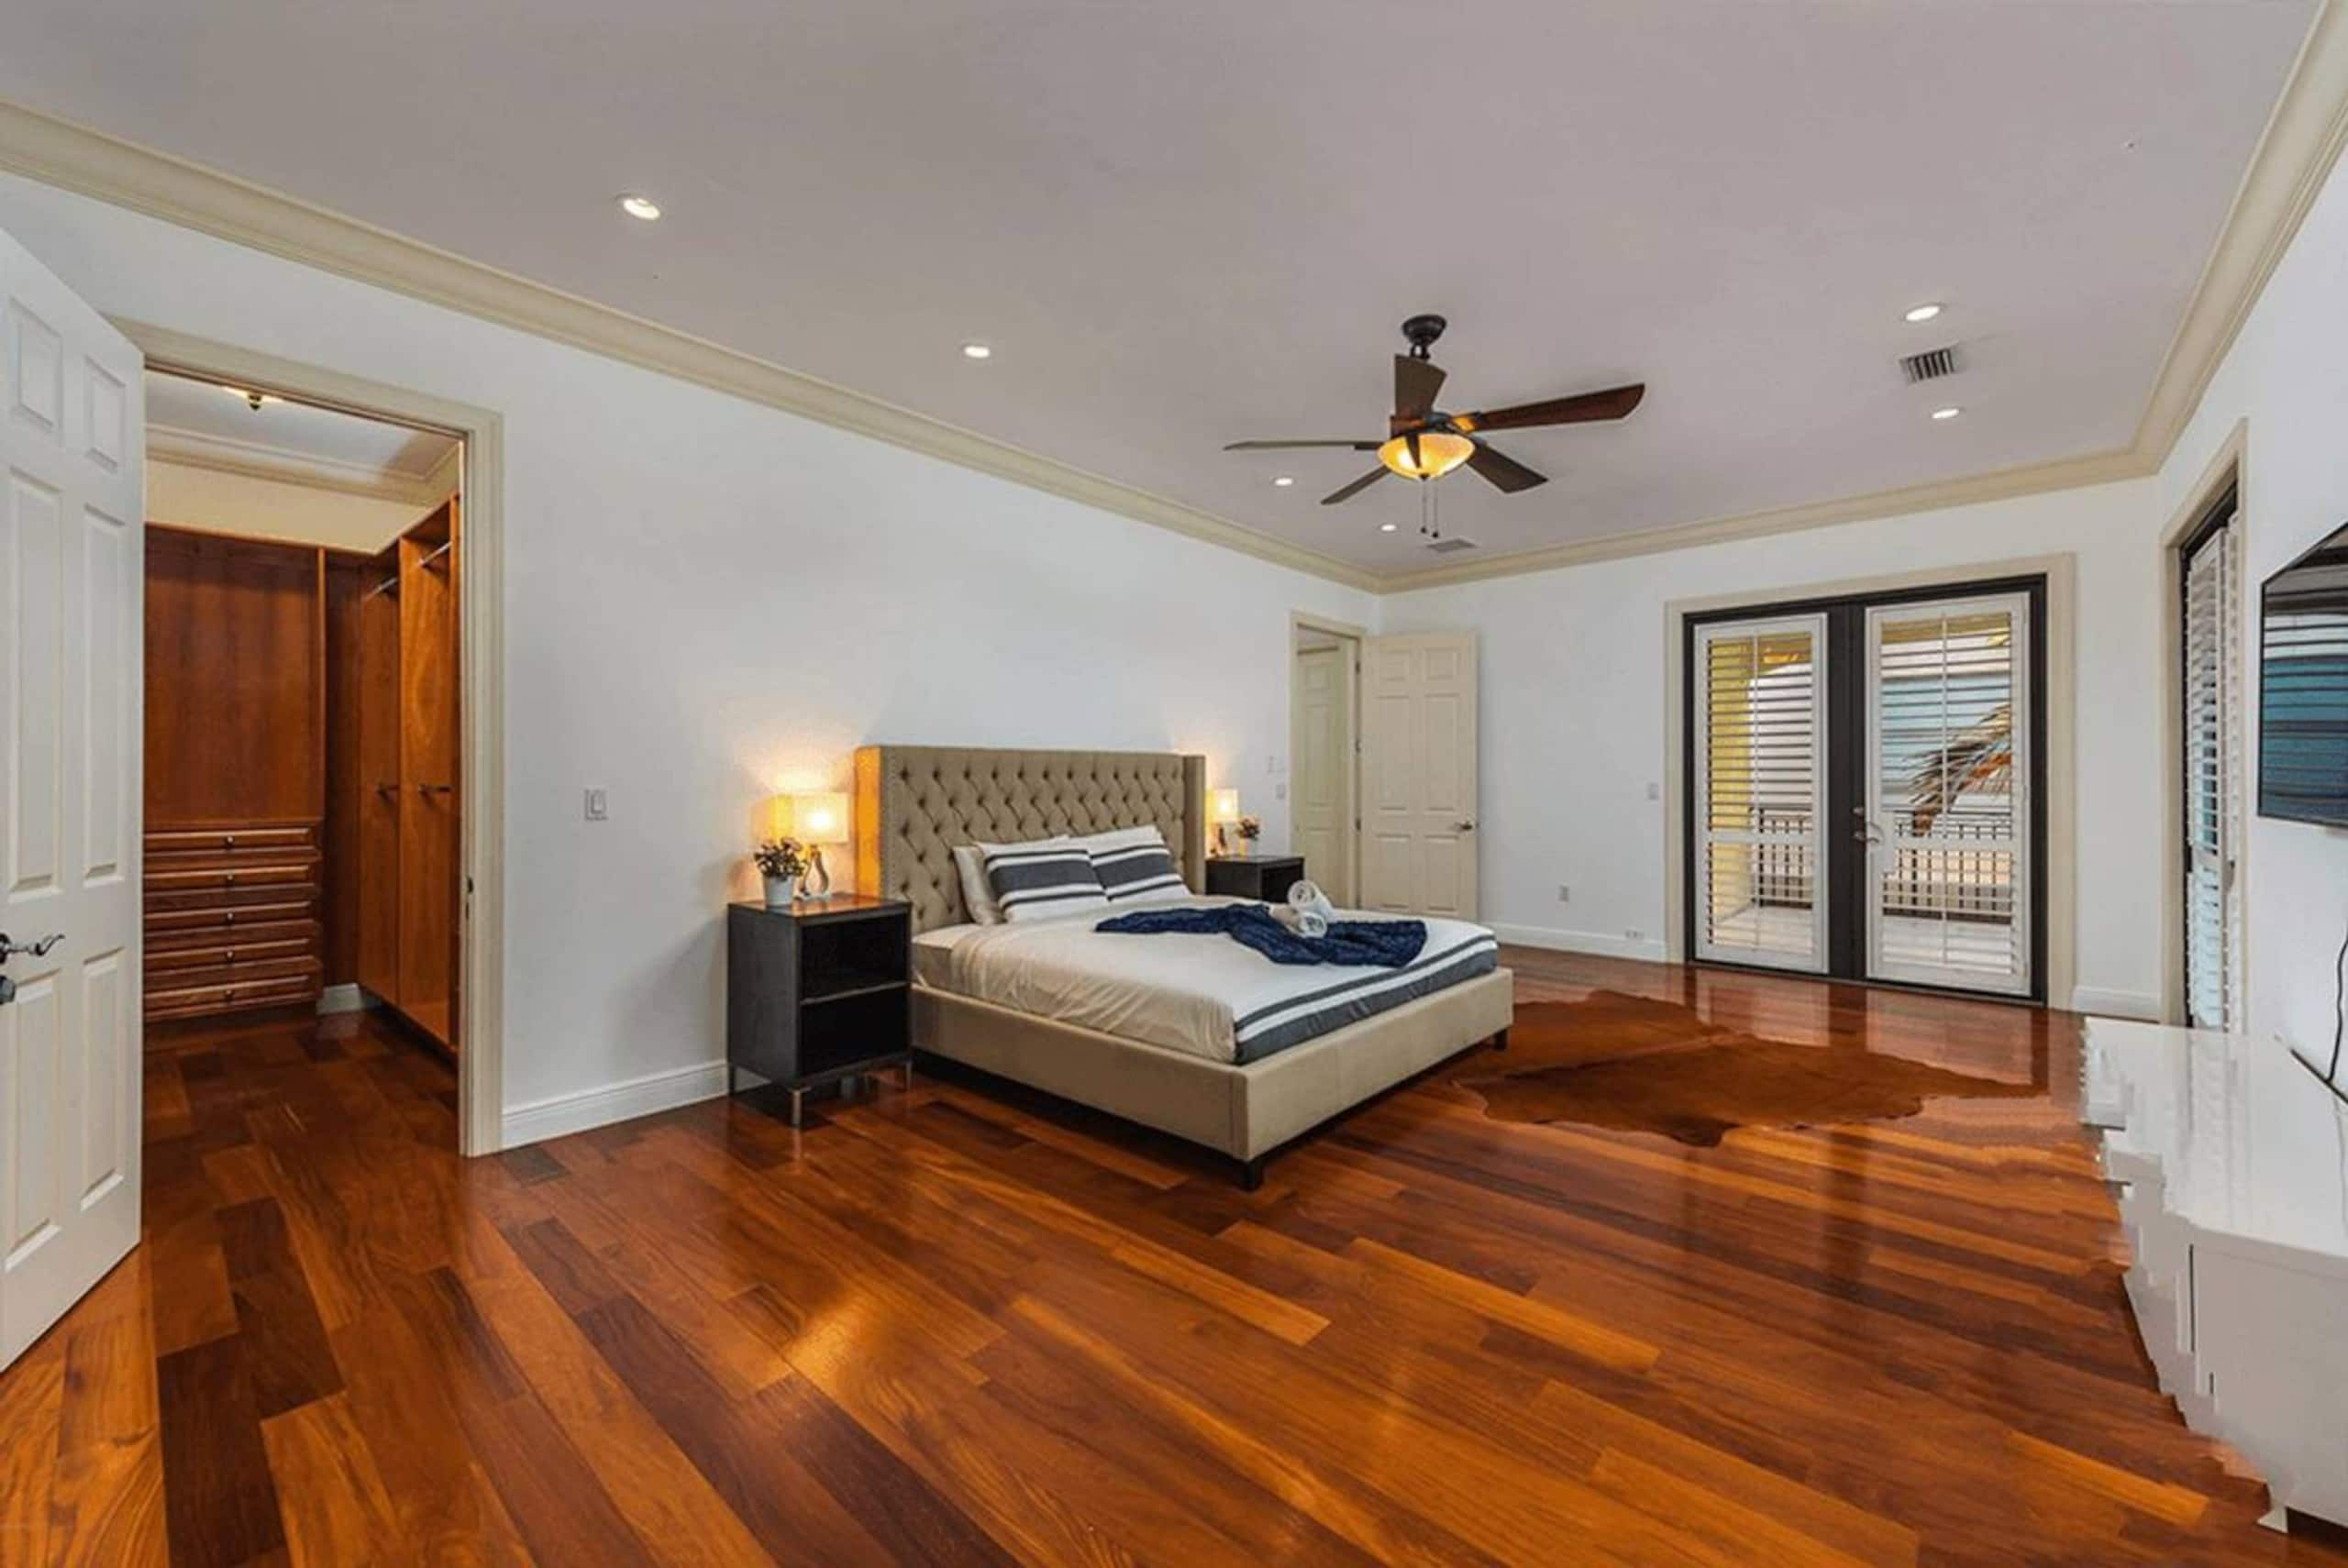 Apartment Villa Lawrence - Luxury Villa photo 22682484